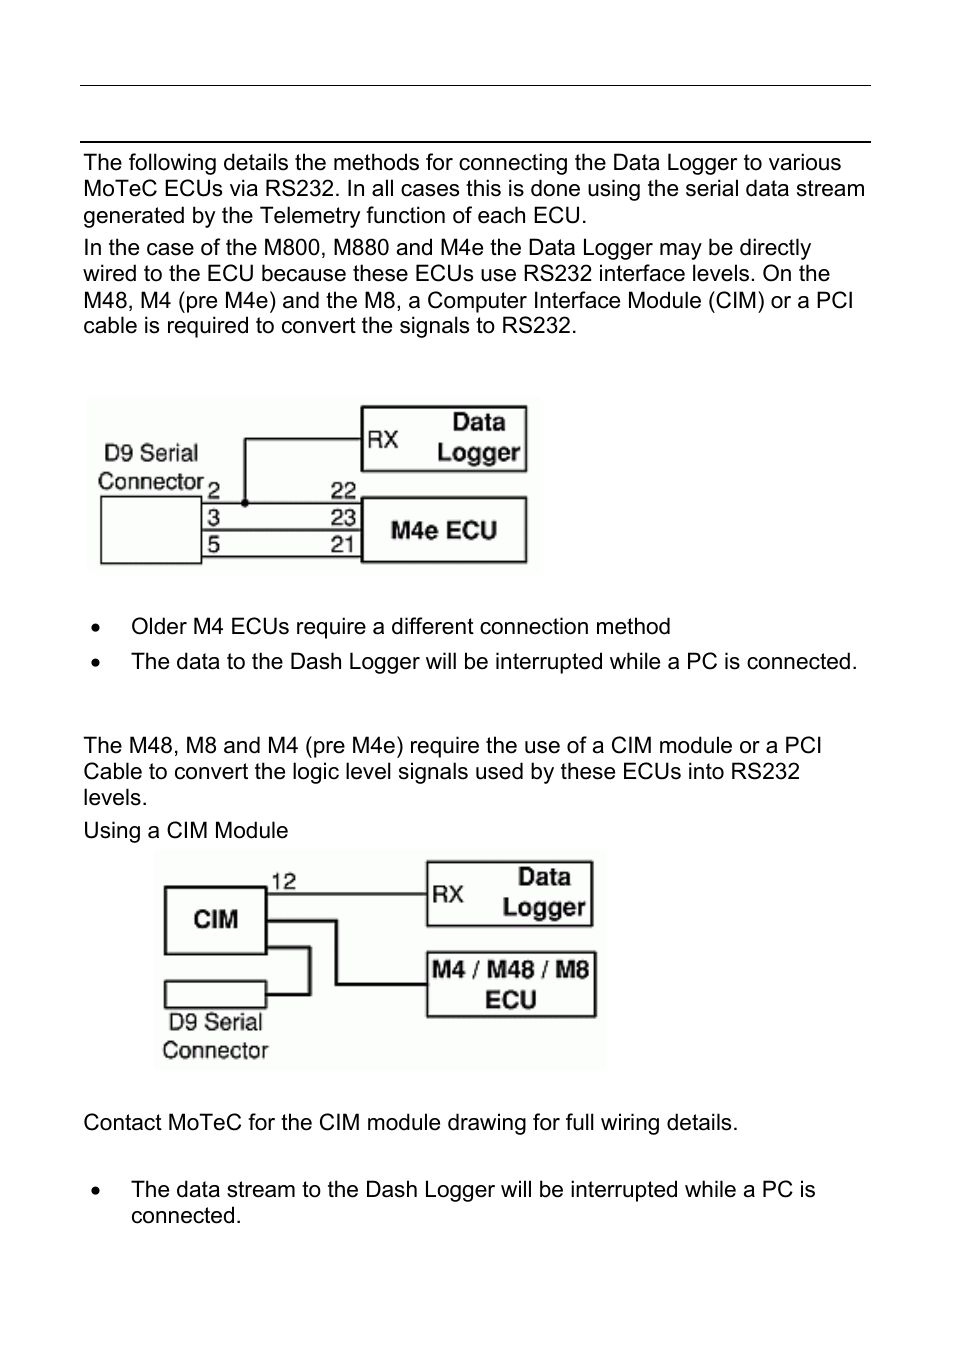 motec cdl3 page68 cdl3 dash logger to ecu wiring (rs232) motec cdl3 user manual motec m4 wiring diagram at mifinder.co